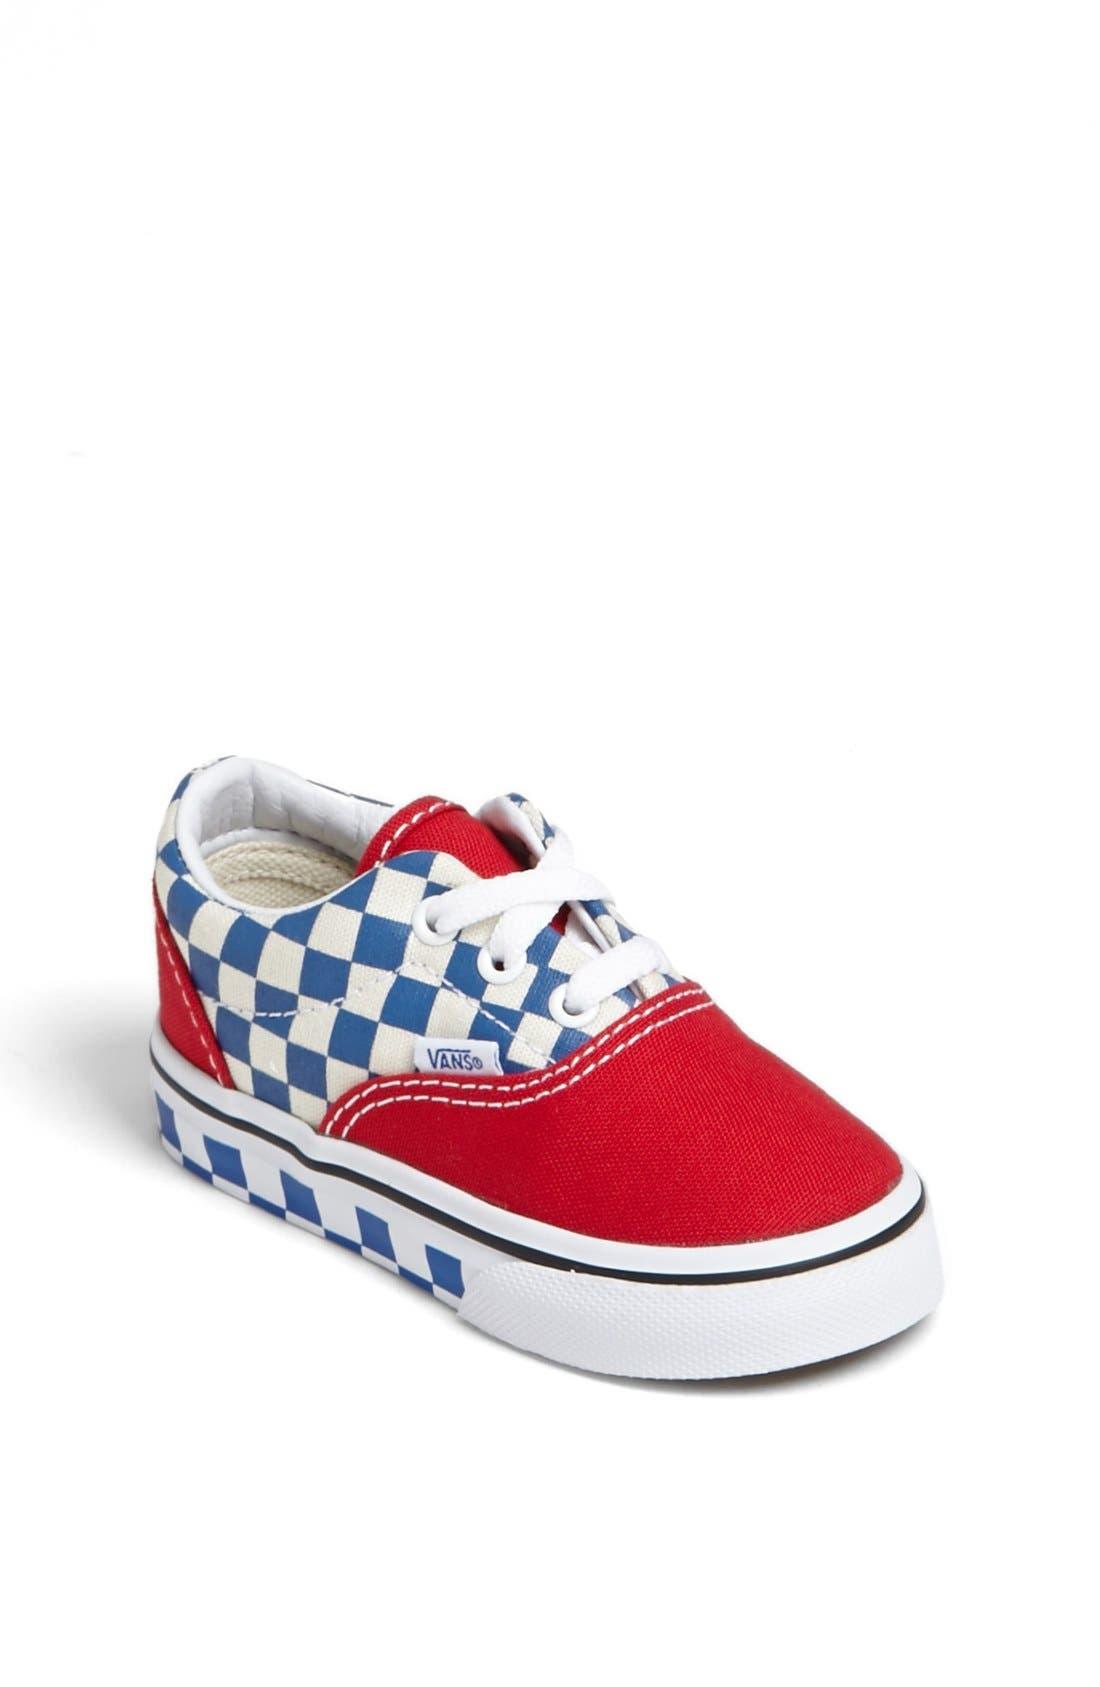 Main Image - Vans 'Era - Checkerboard' Sneaker (Baby, Walker & Toddler)